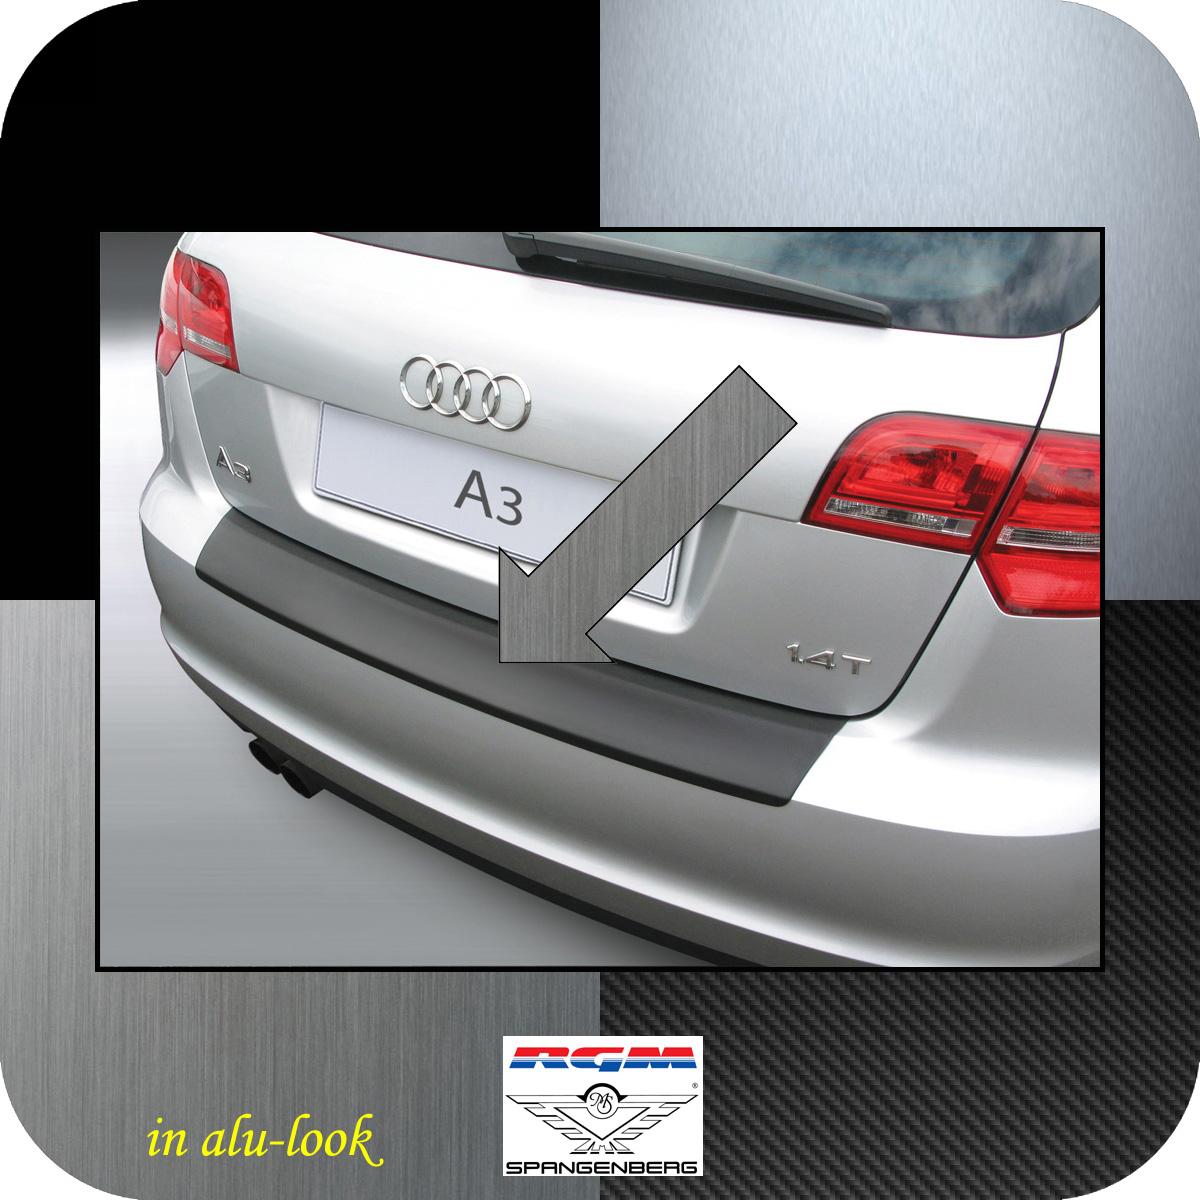 Ladekantenschutz Alu-Look Audi A3 Sportback auch S3 ab Mopf 2008-13 3504362